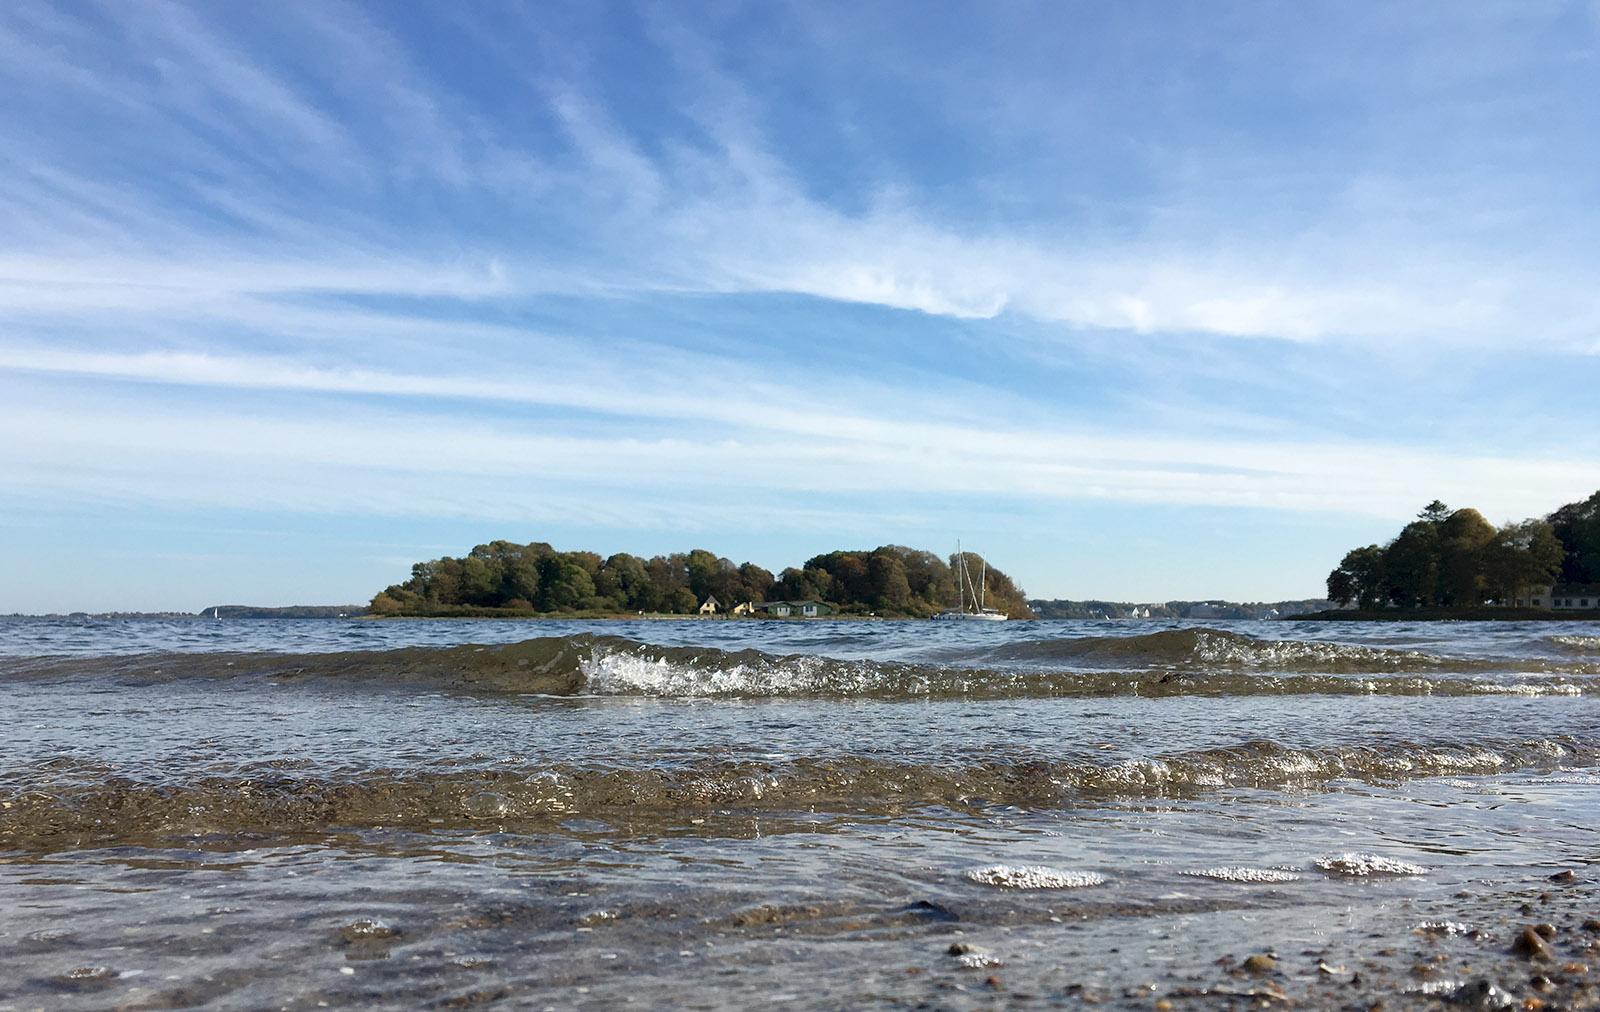 Blick von Sønderhav auf die Ochseninseln der Flensburger Förde. Foto: Hilke Maunder